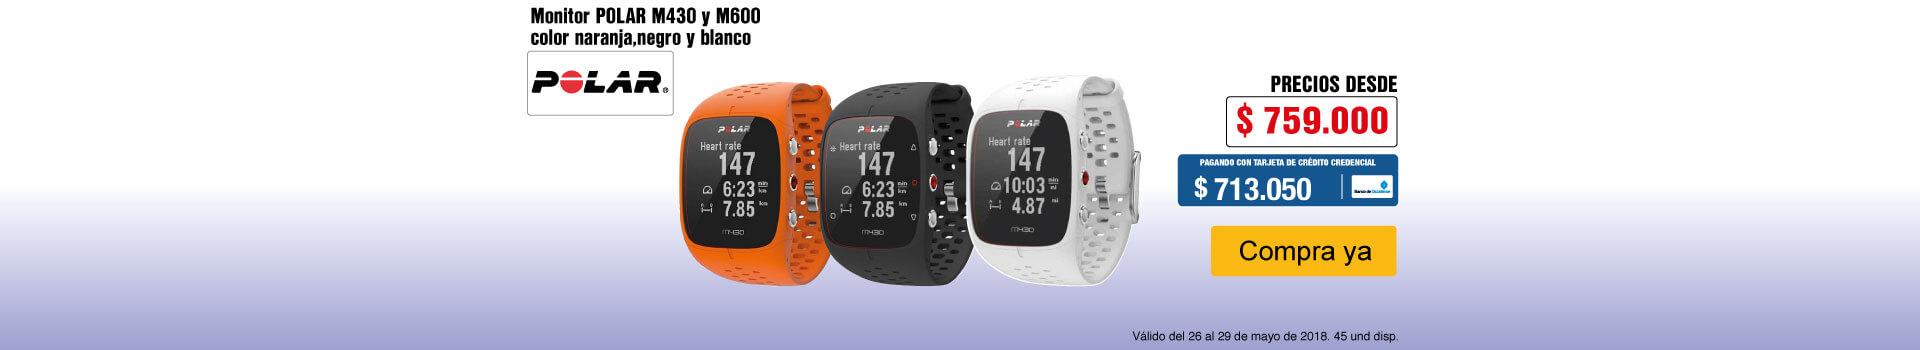 AK-KT-HIPER-2-accesorios-PP---Polar-relojes-May26